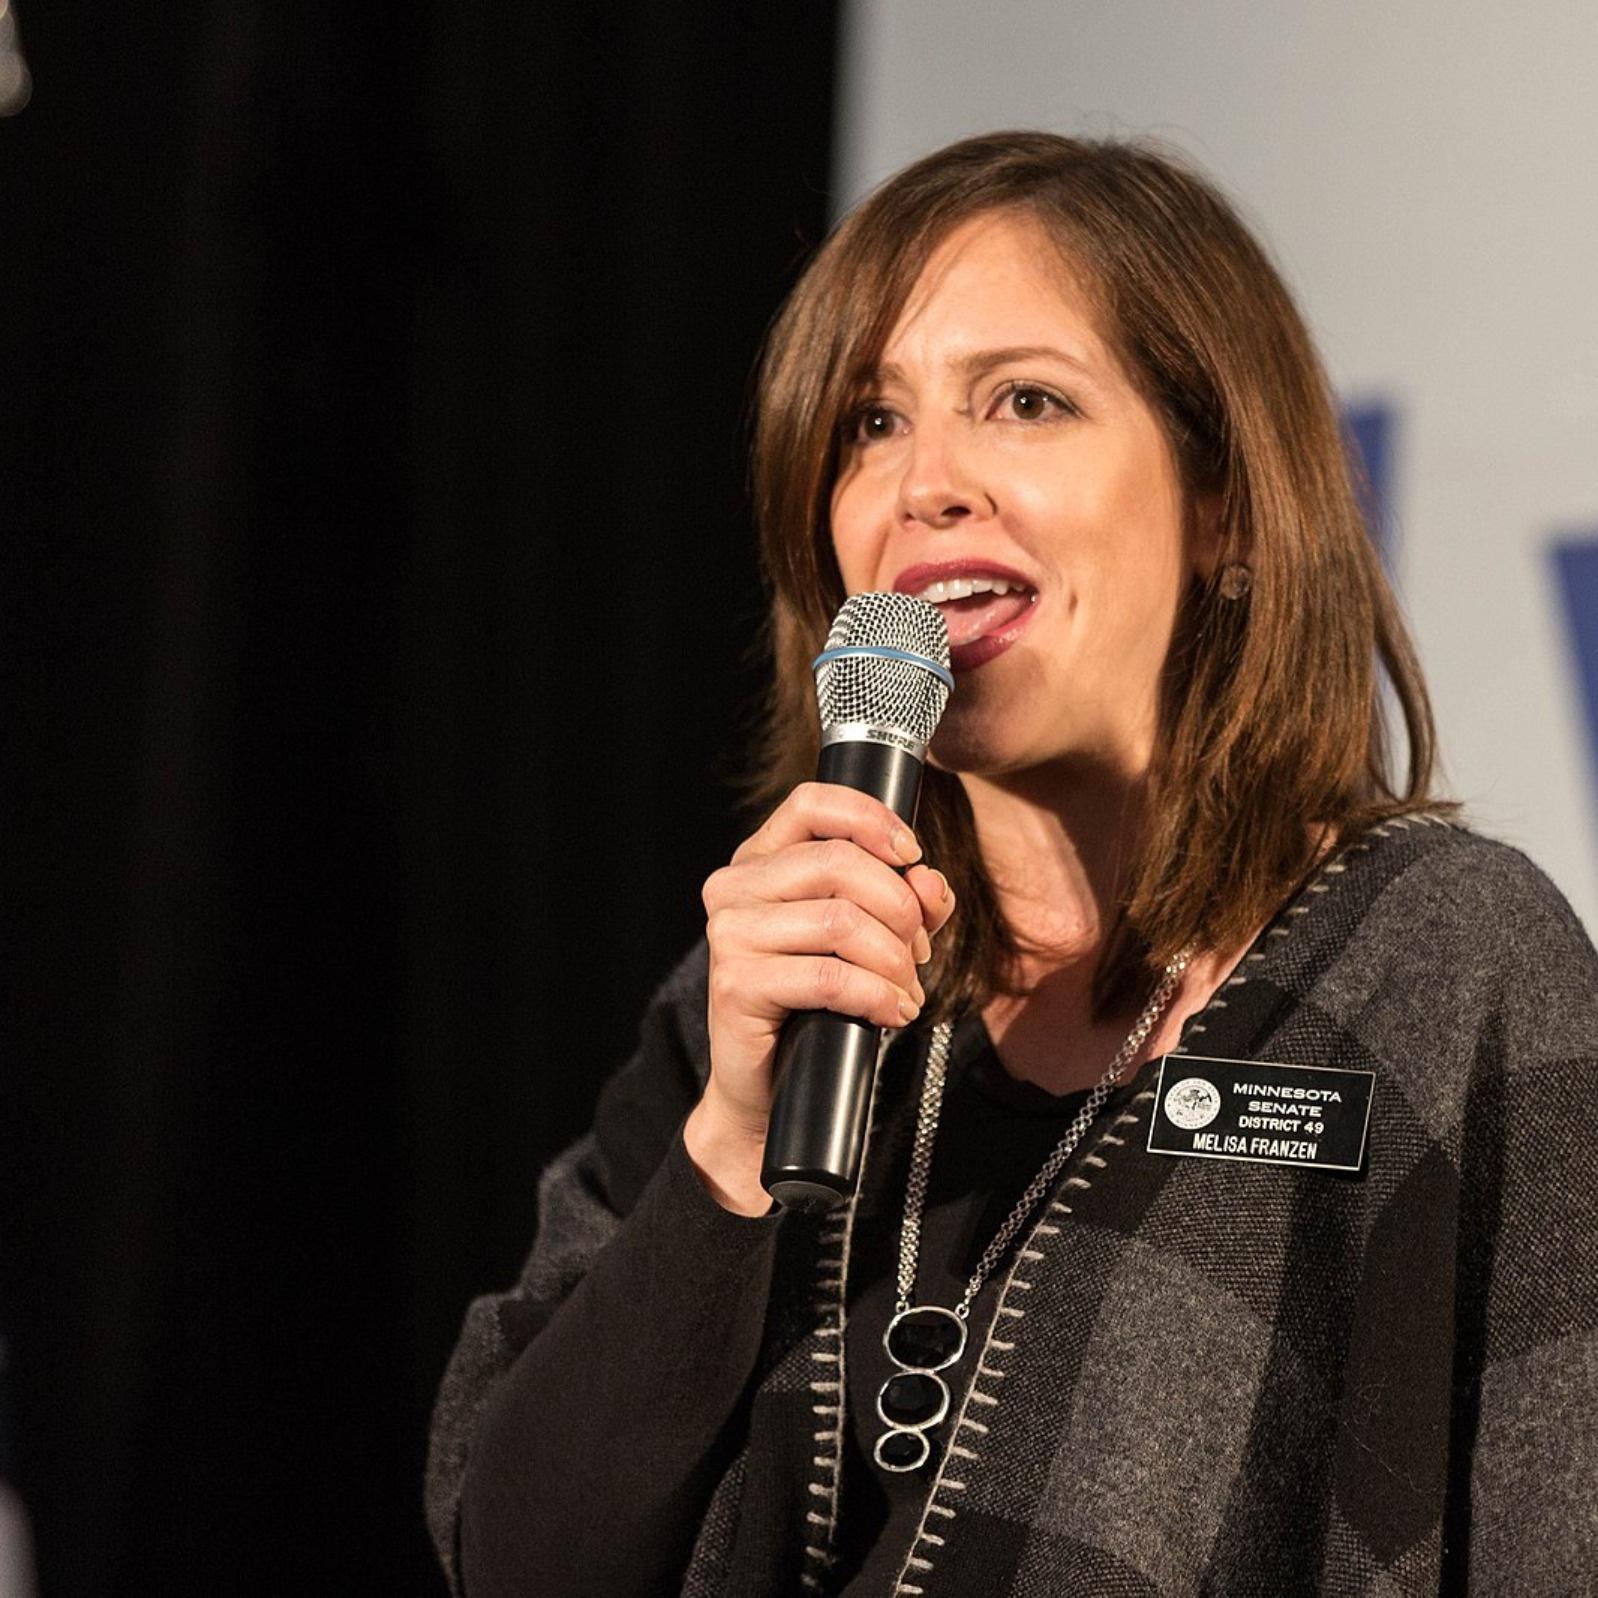 MN Cannabis Conversations with Senator Melisa Franzen (DFL)